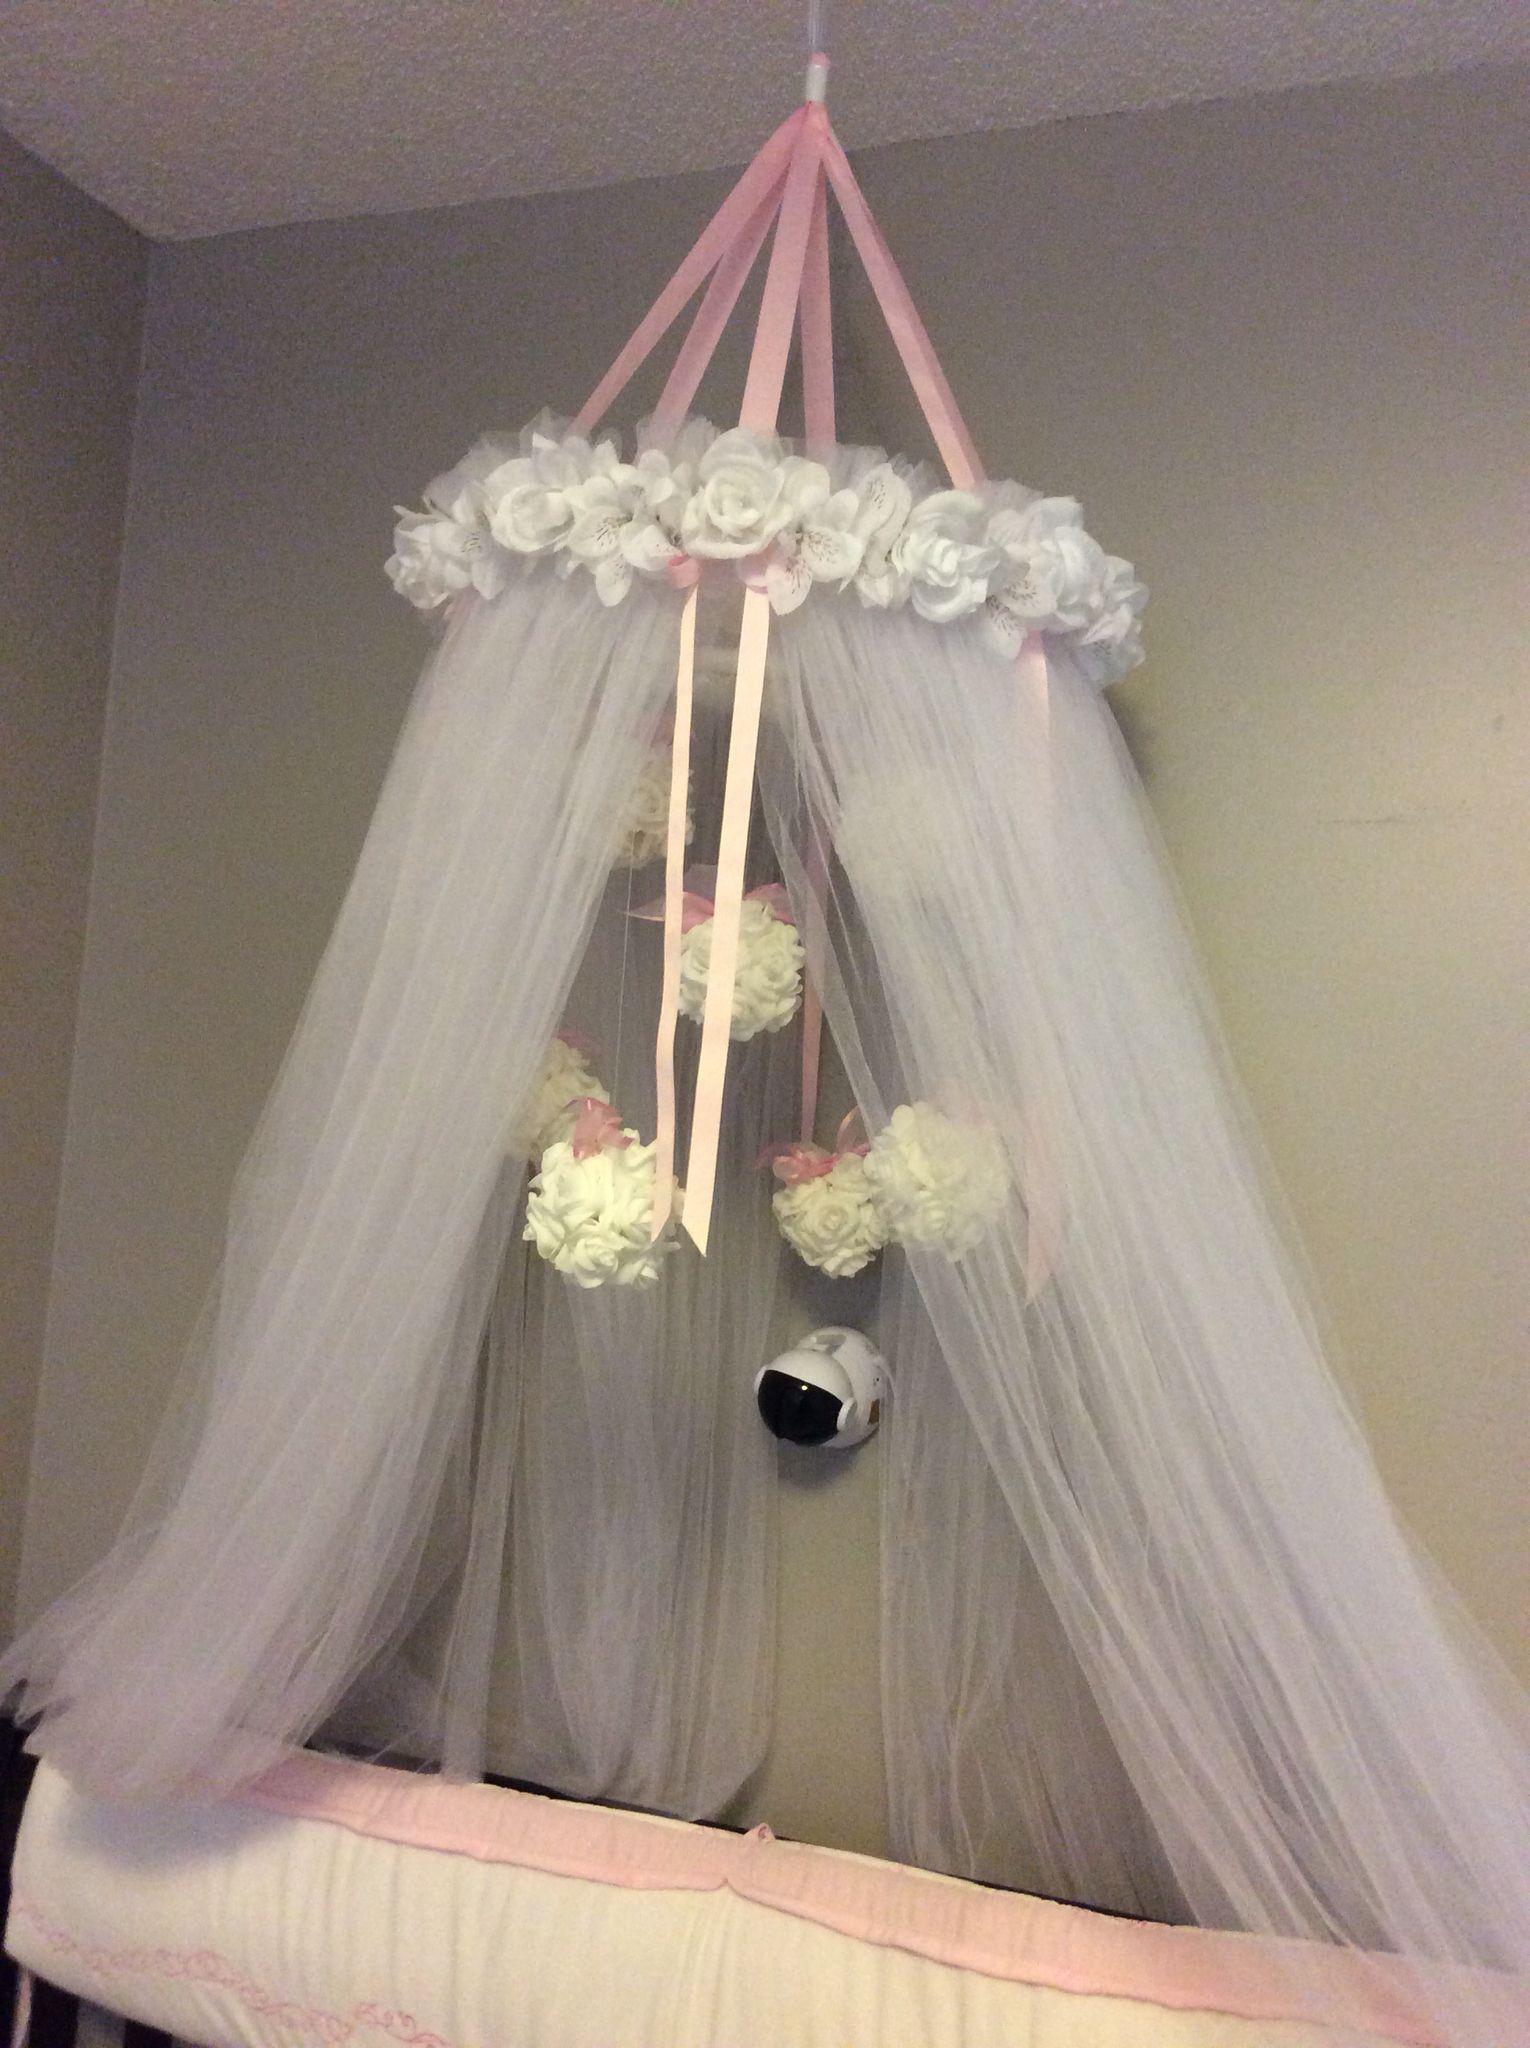 Diy baby princess canopy over crib girl with